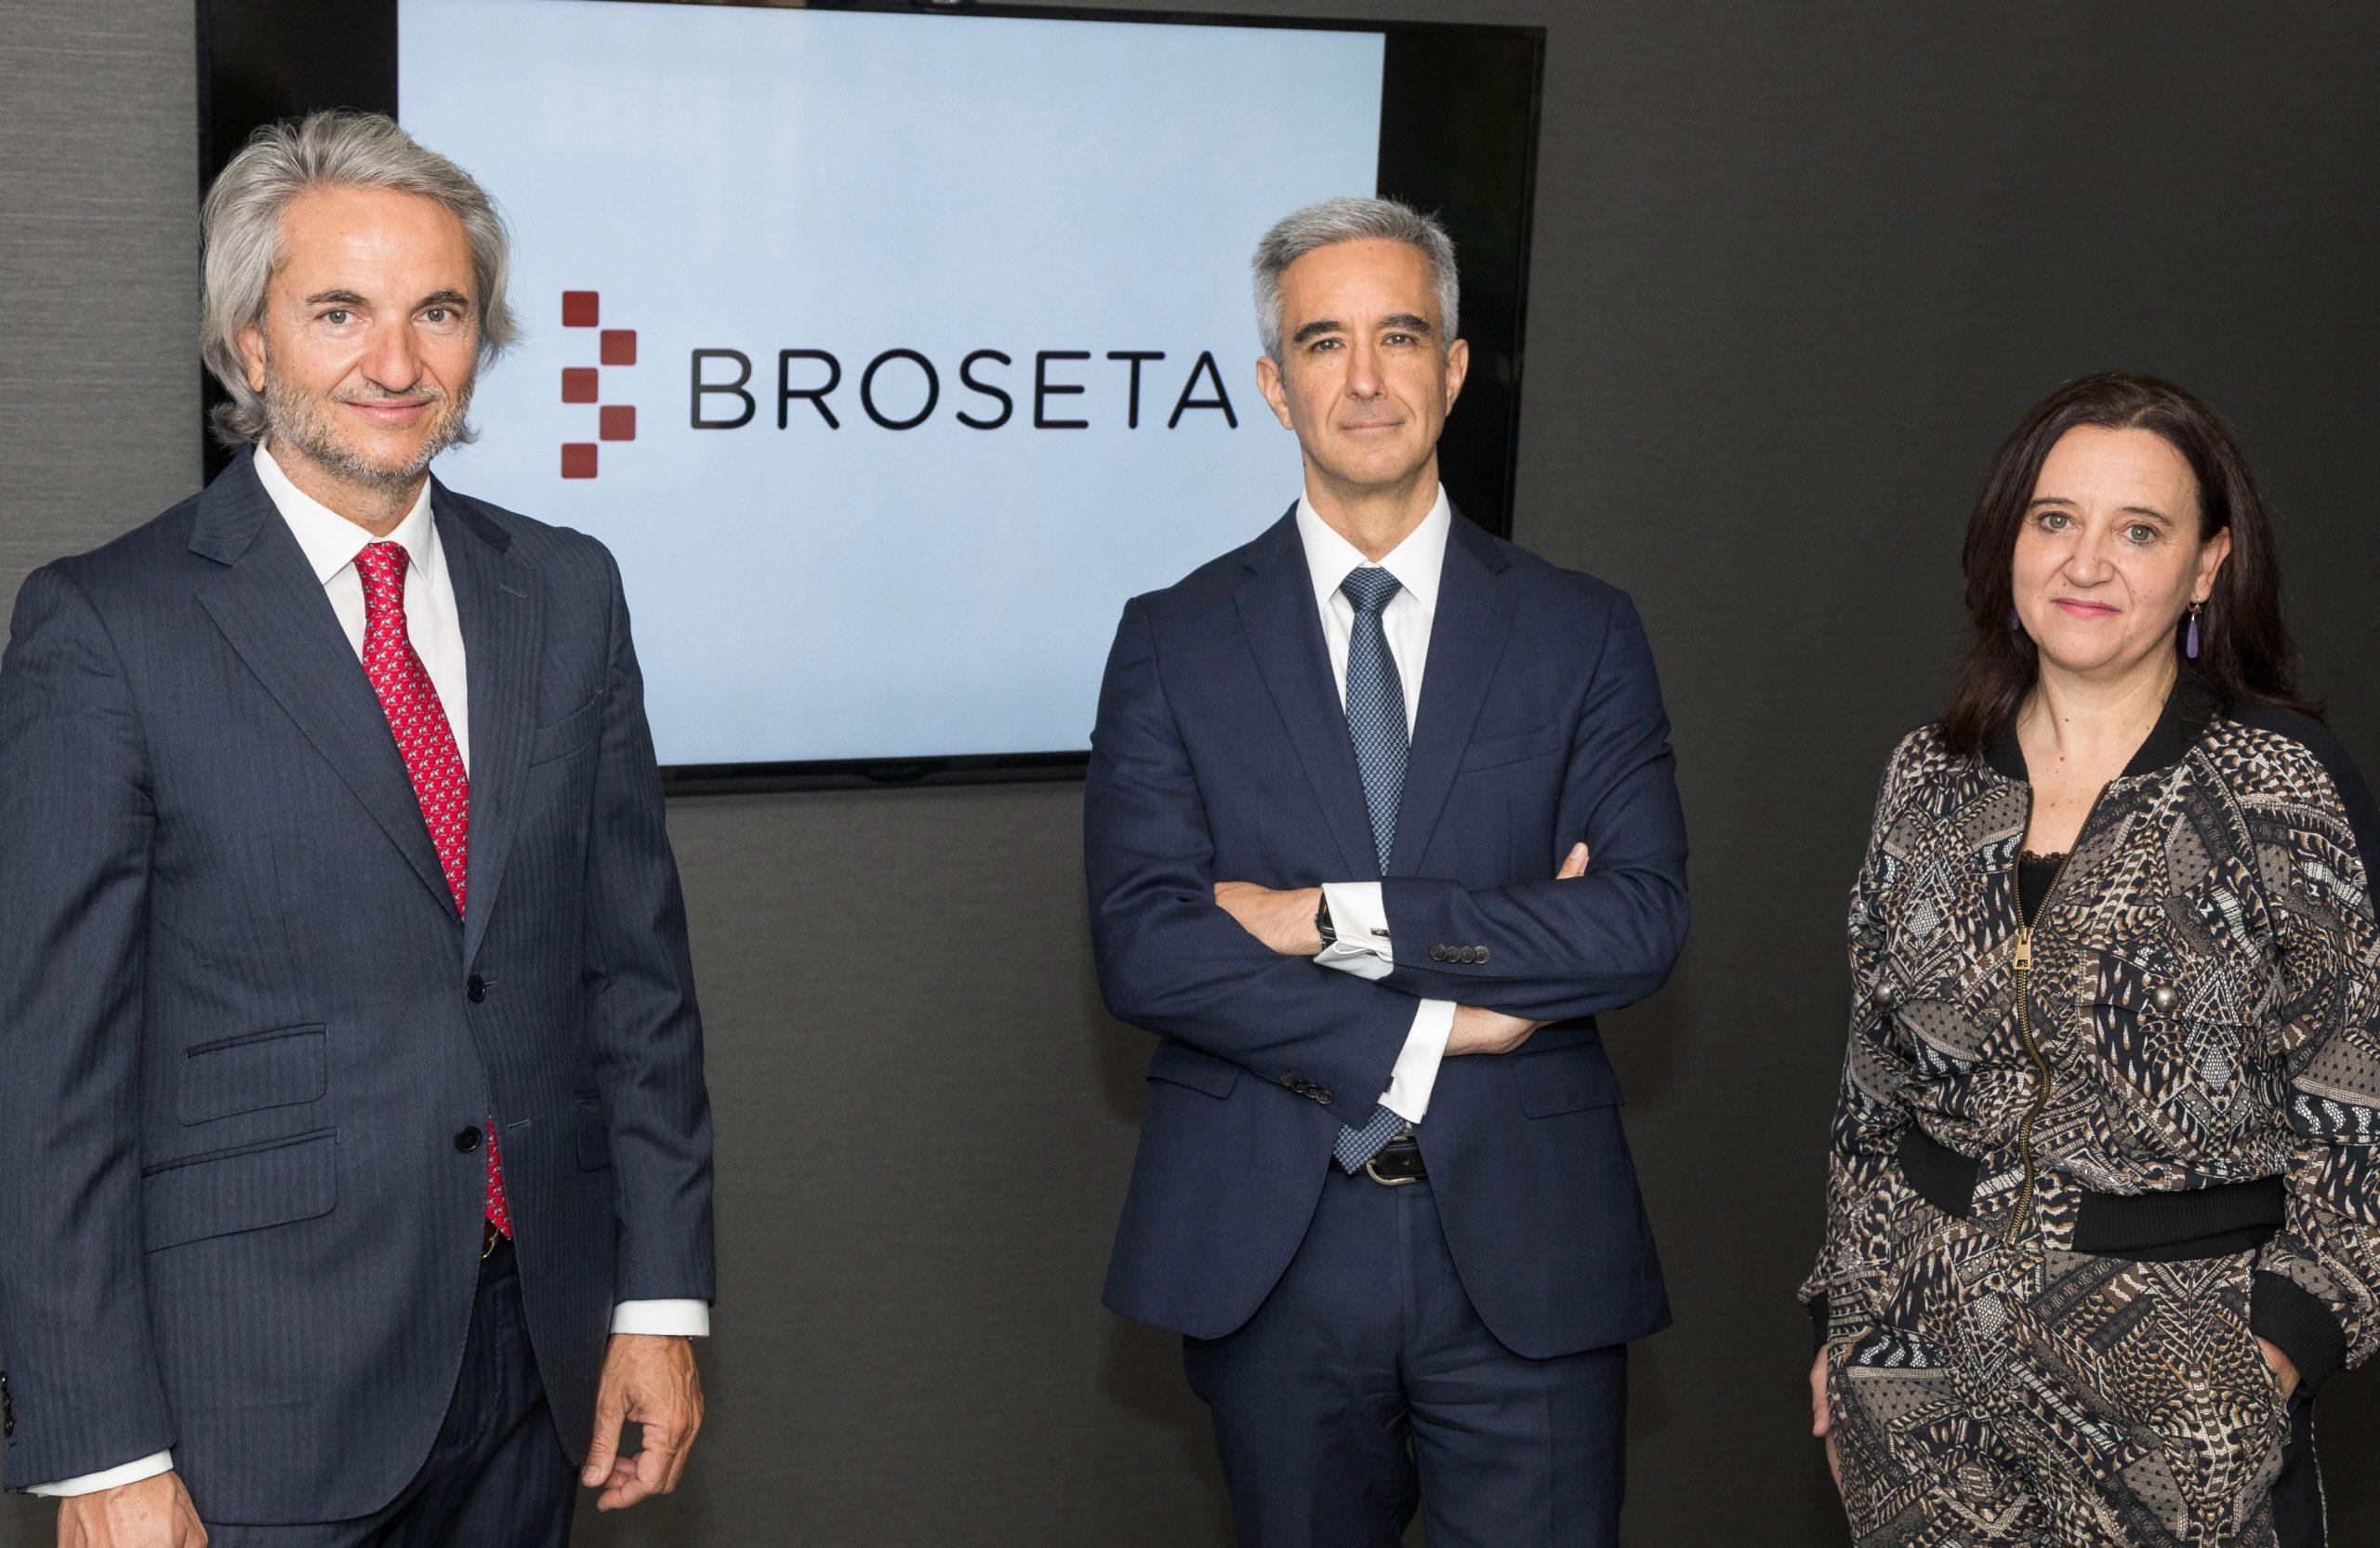 Nuevo fichaje de BROSETA: Andrés Campaña se une a la Firma